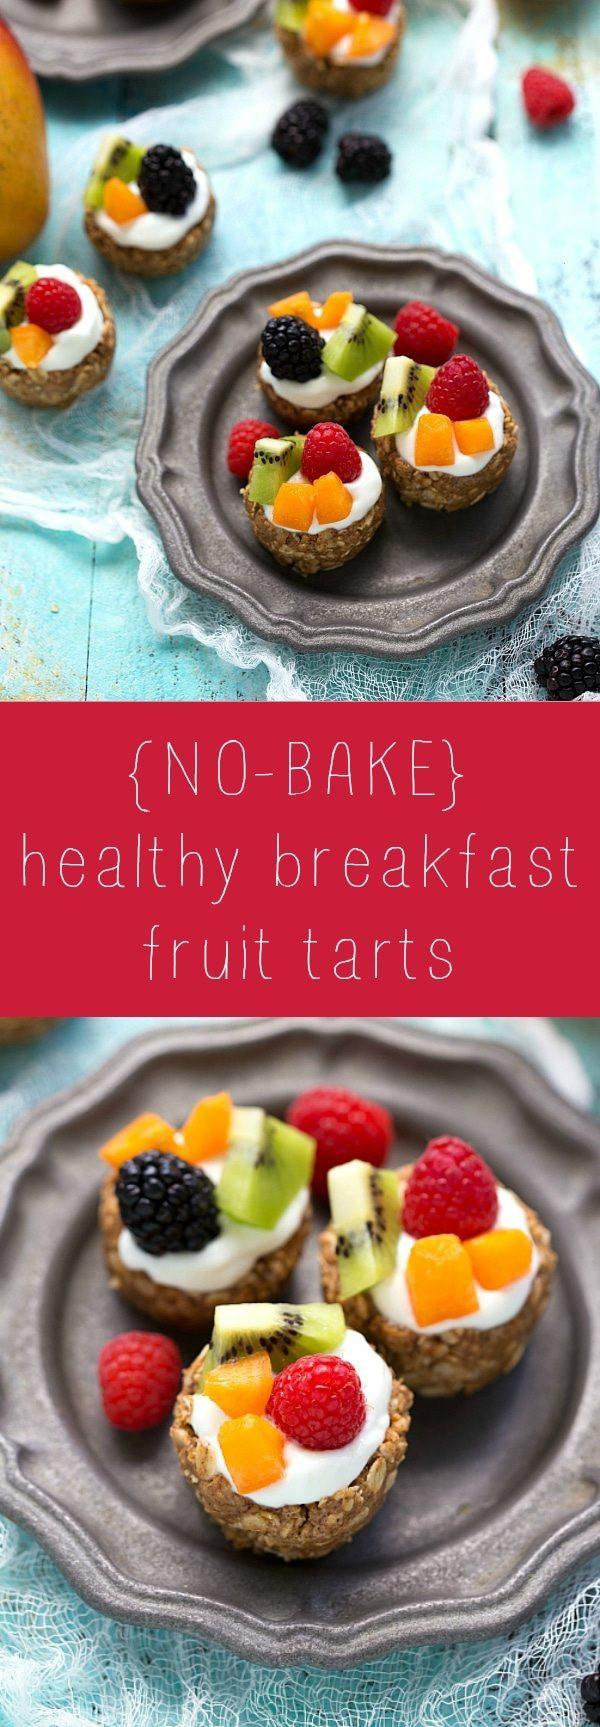 Healthy Breakfast Baked Goods  No Bake Healthy Breakfast Fruit Tarts Chelsea s Messy